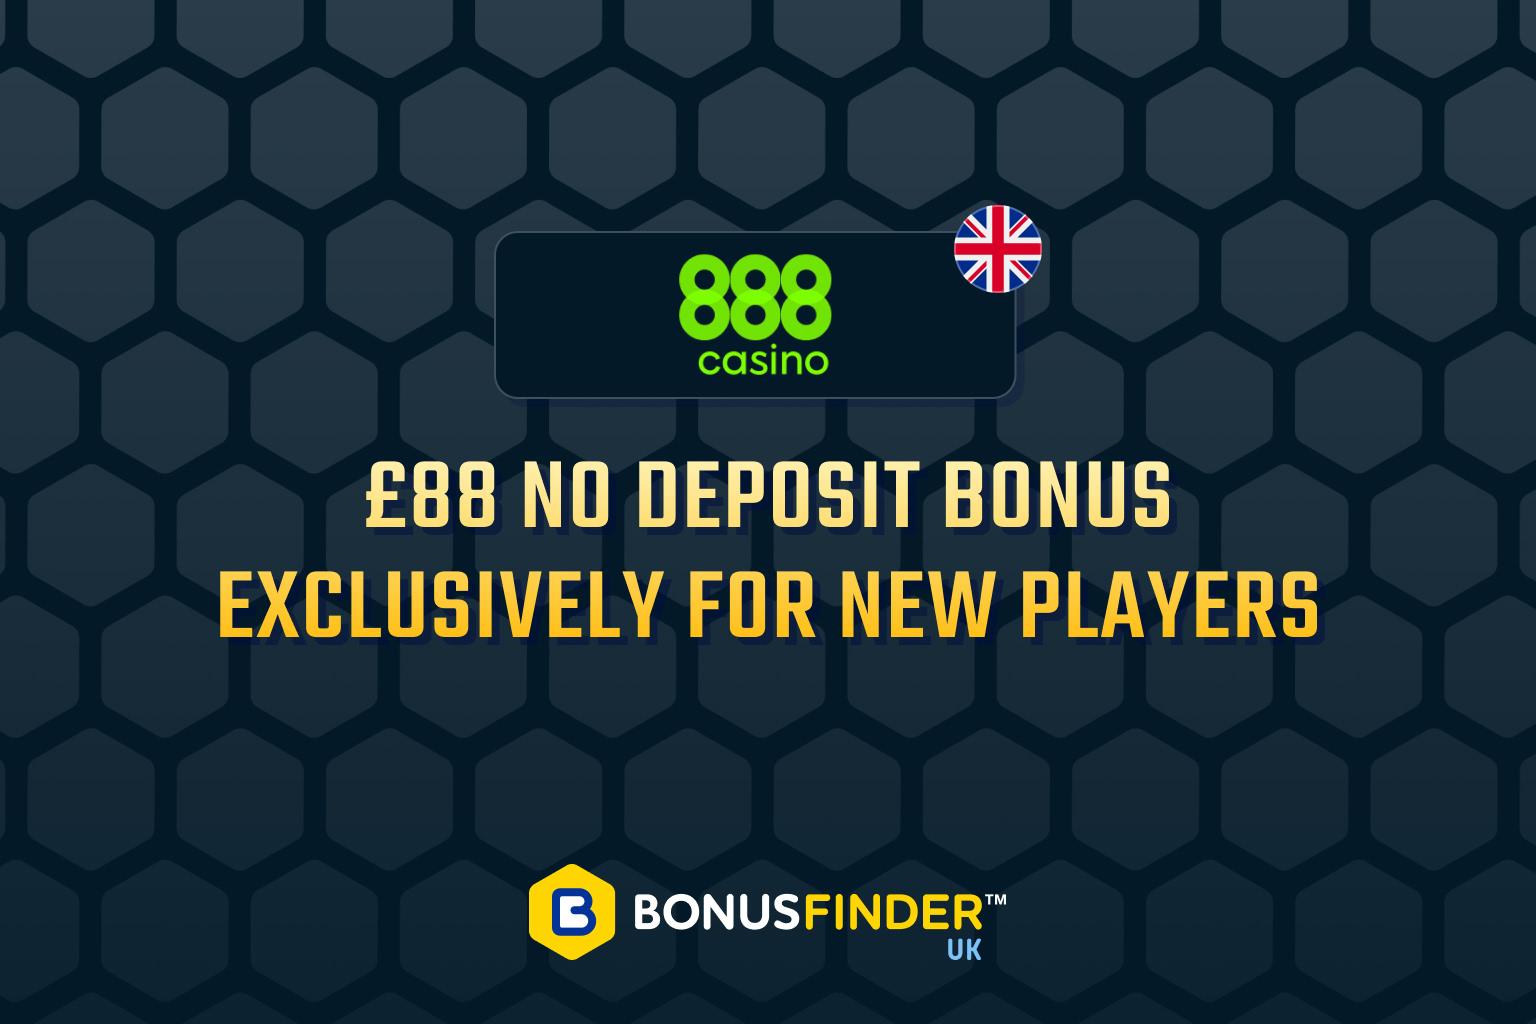 888 casino free spins no deposit bonus